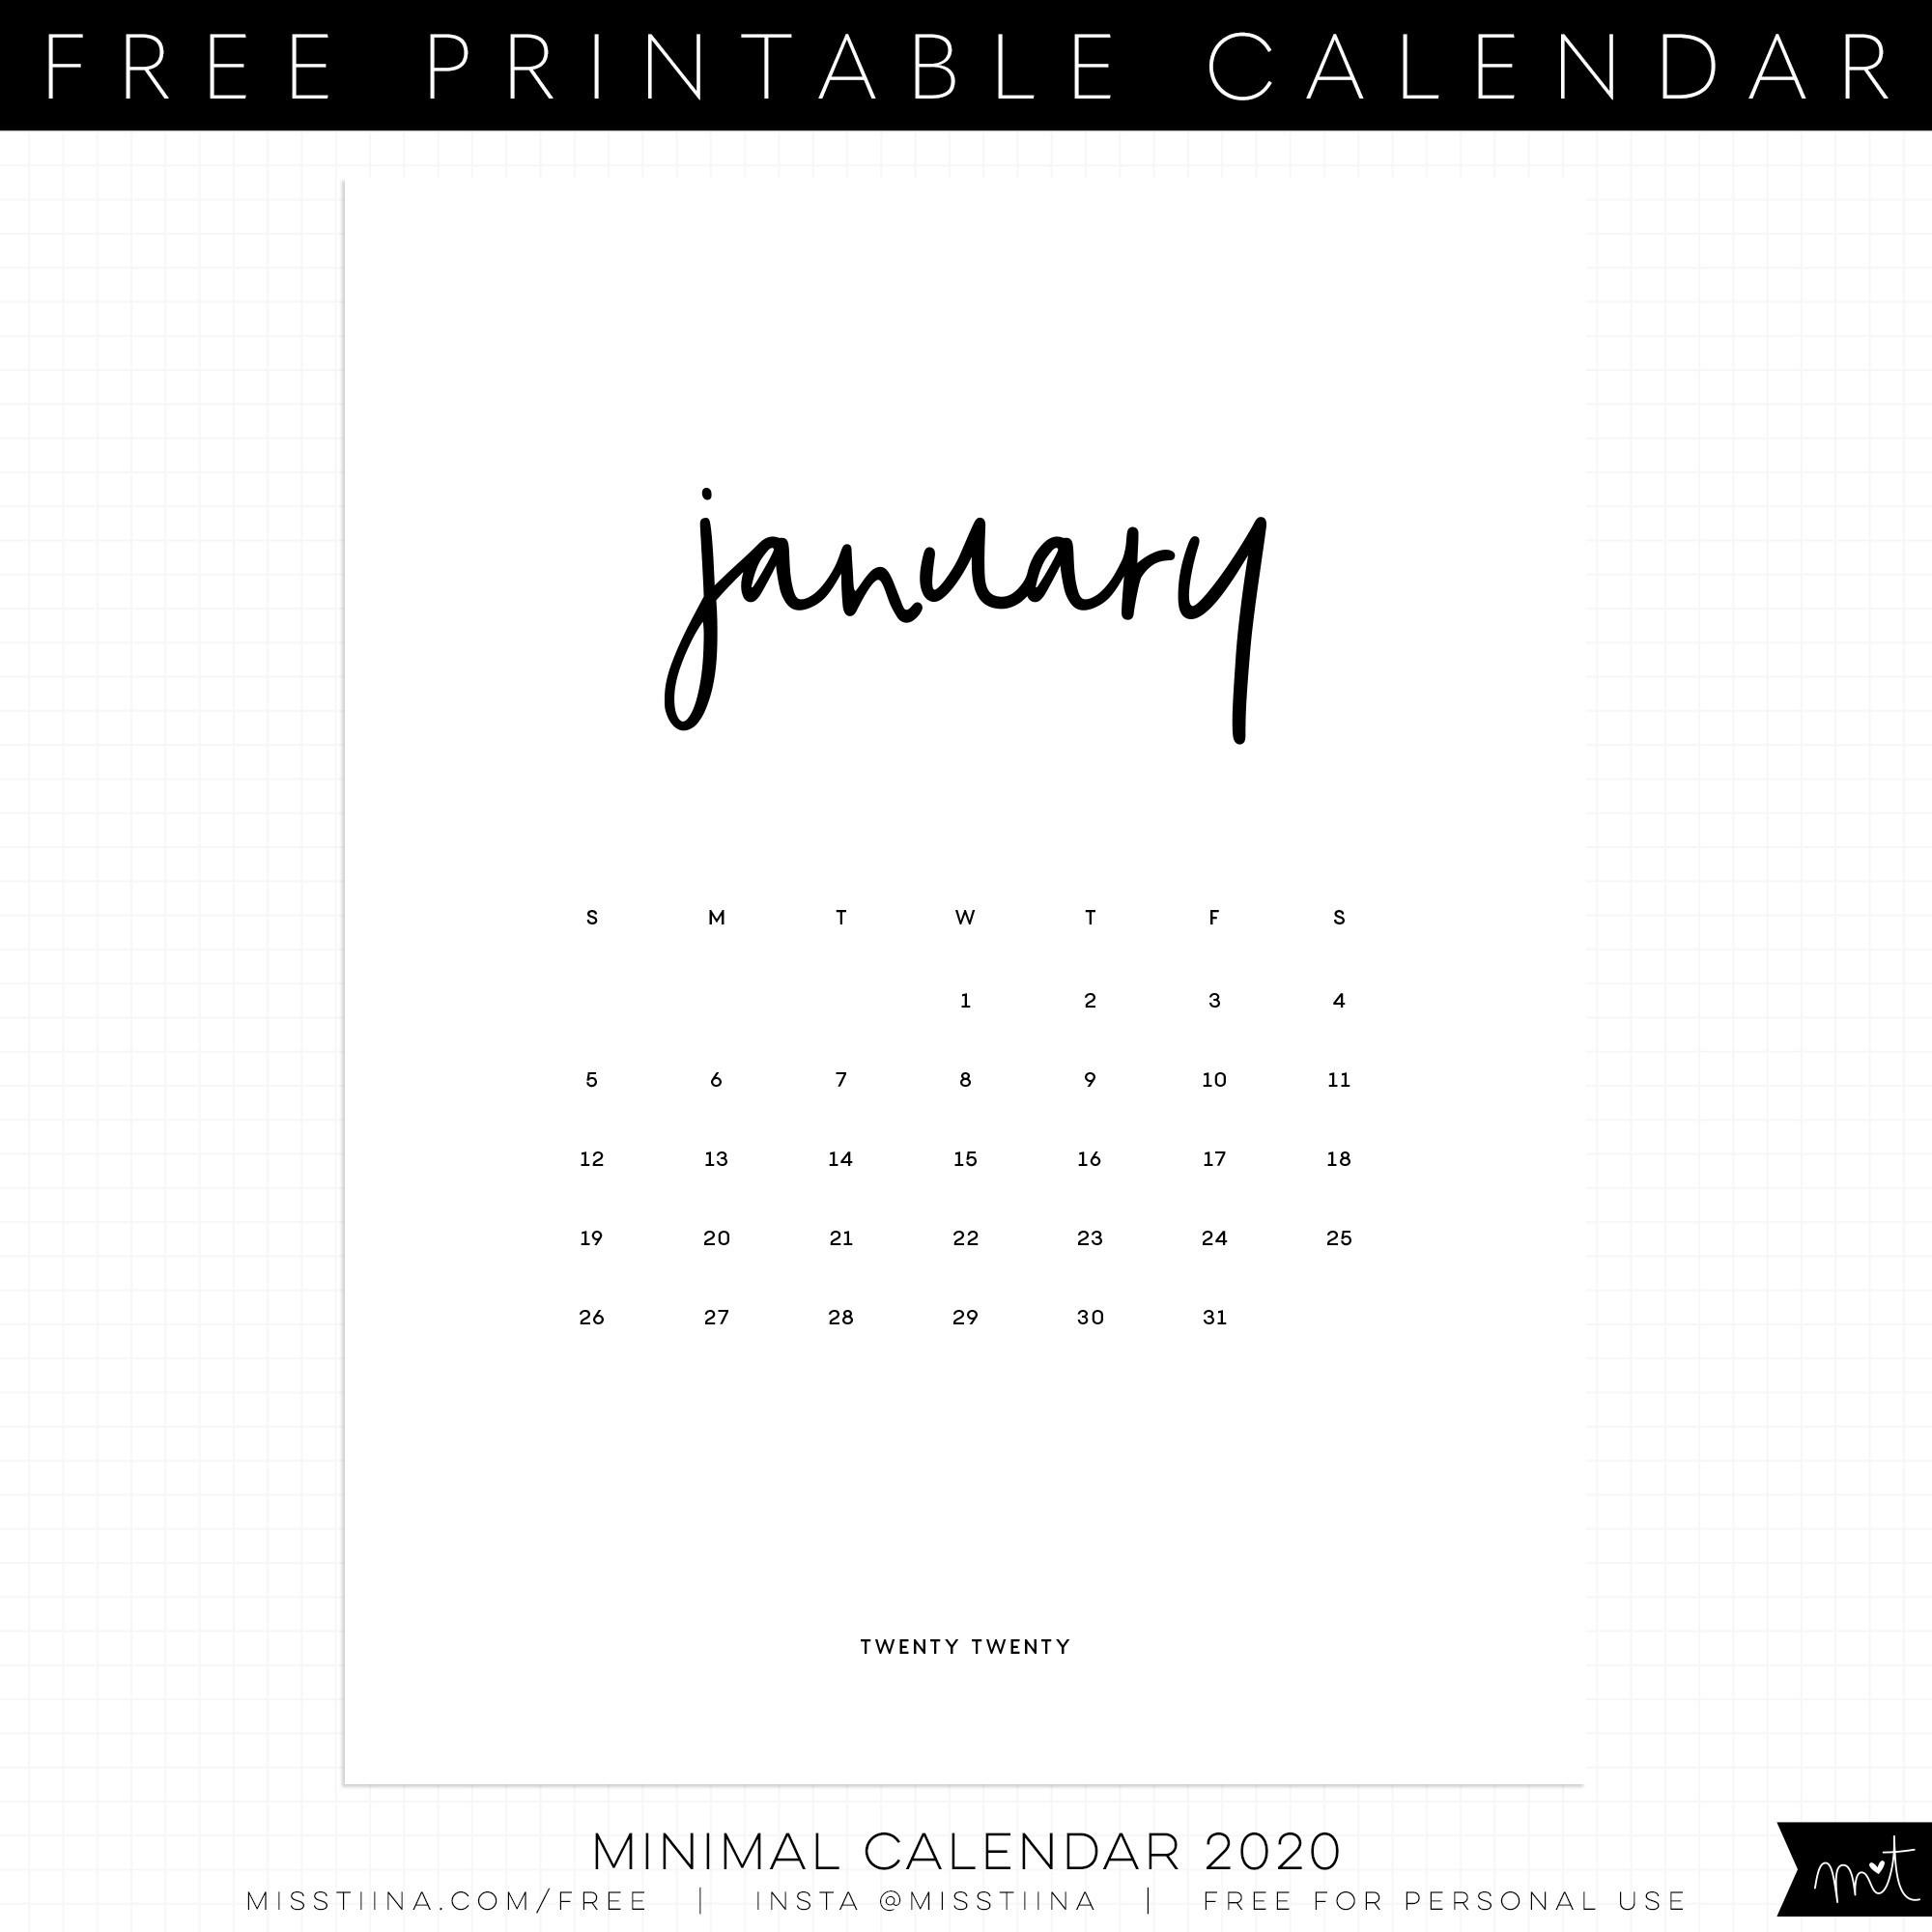 Free 4X6 Printable Calendar 2020 - Template Calendar Design  Printable 4X6 Calendar Template